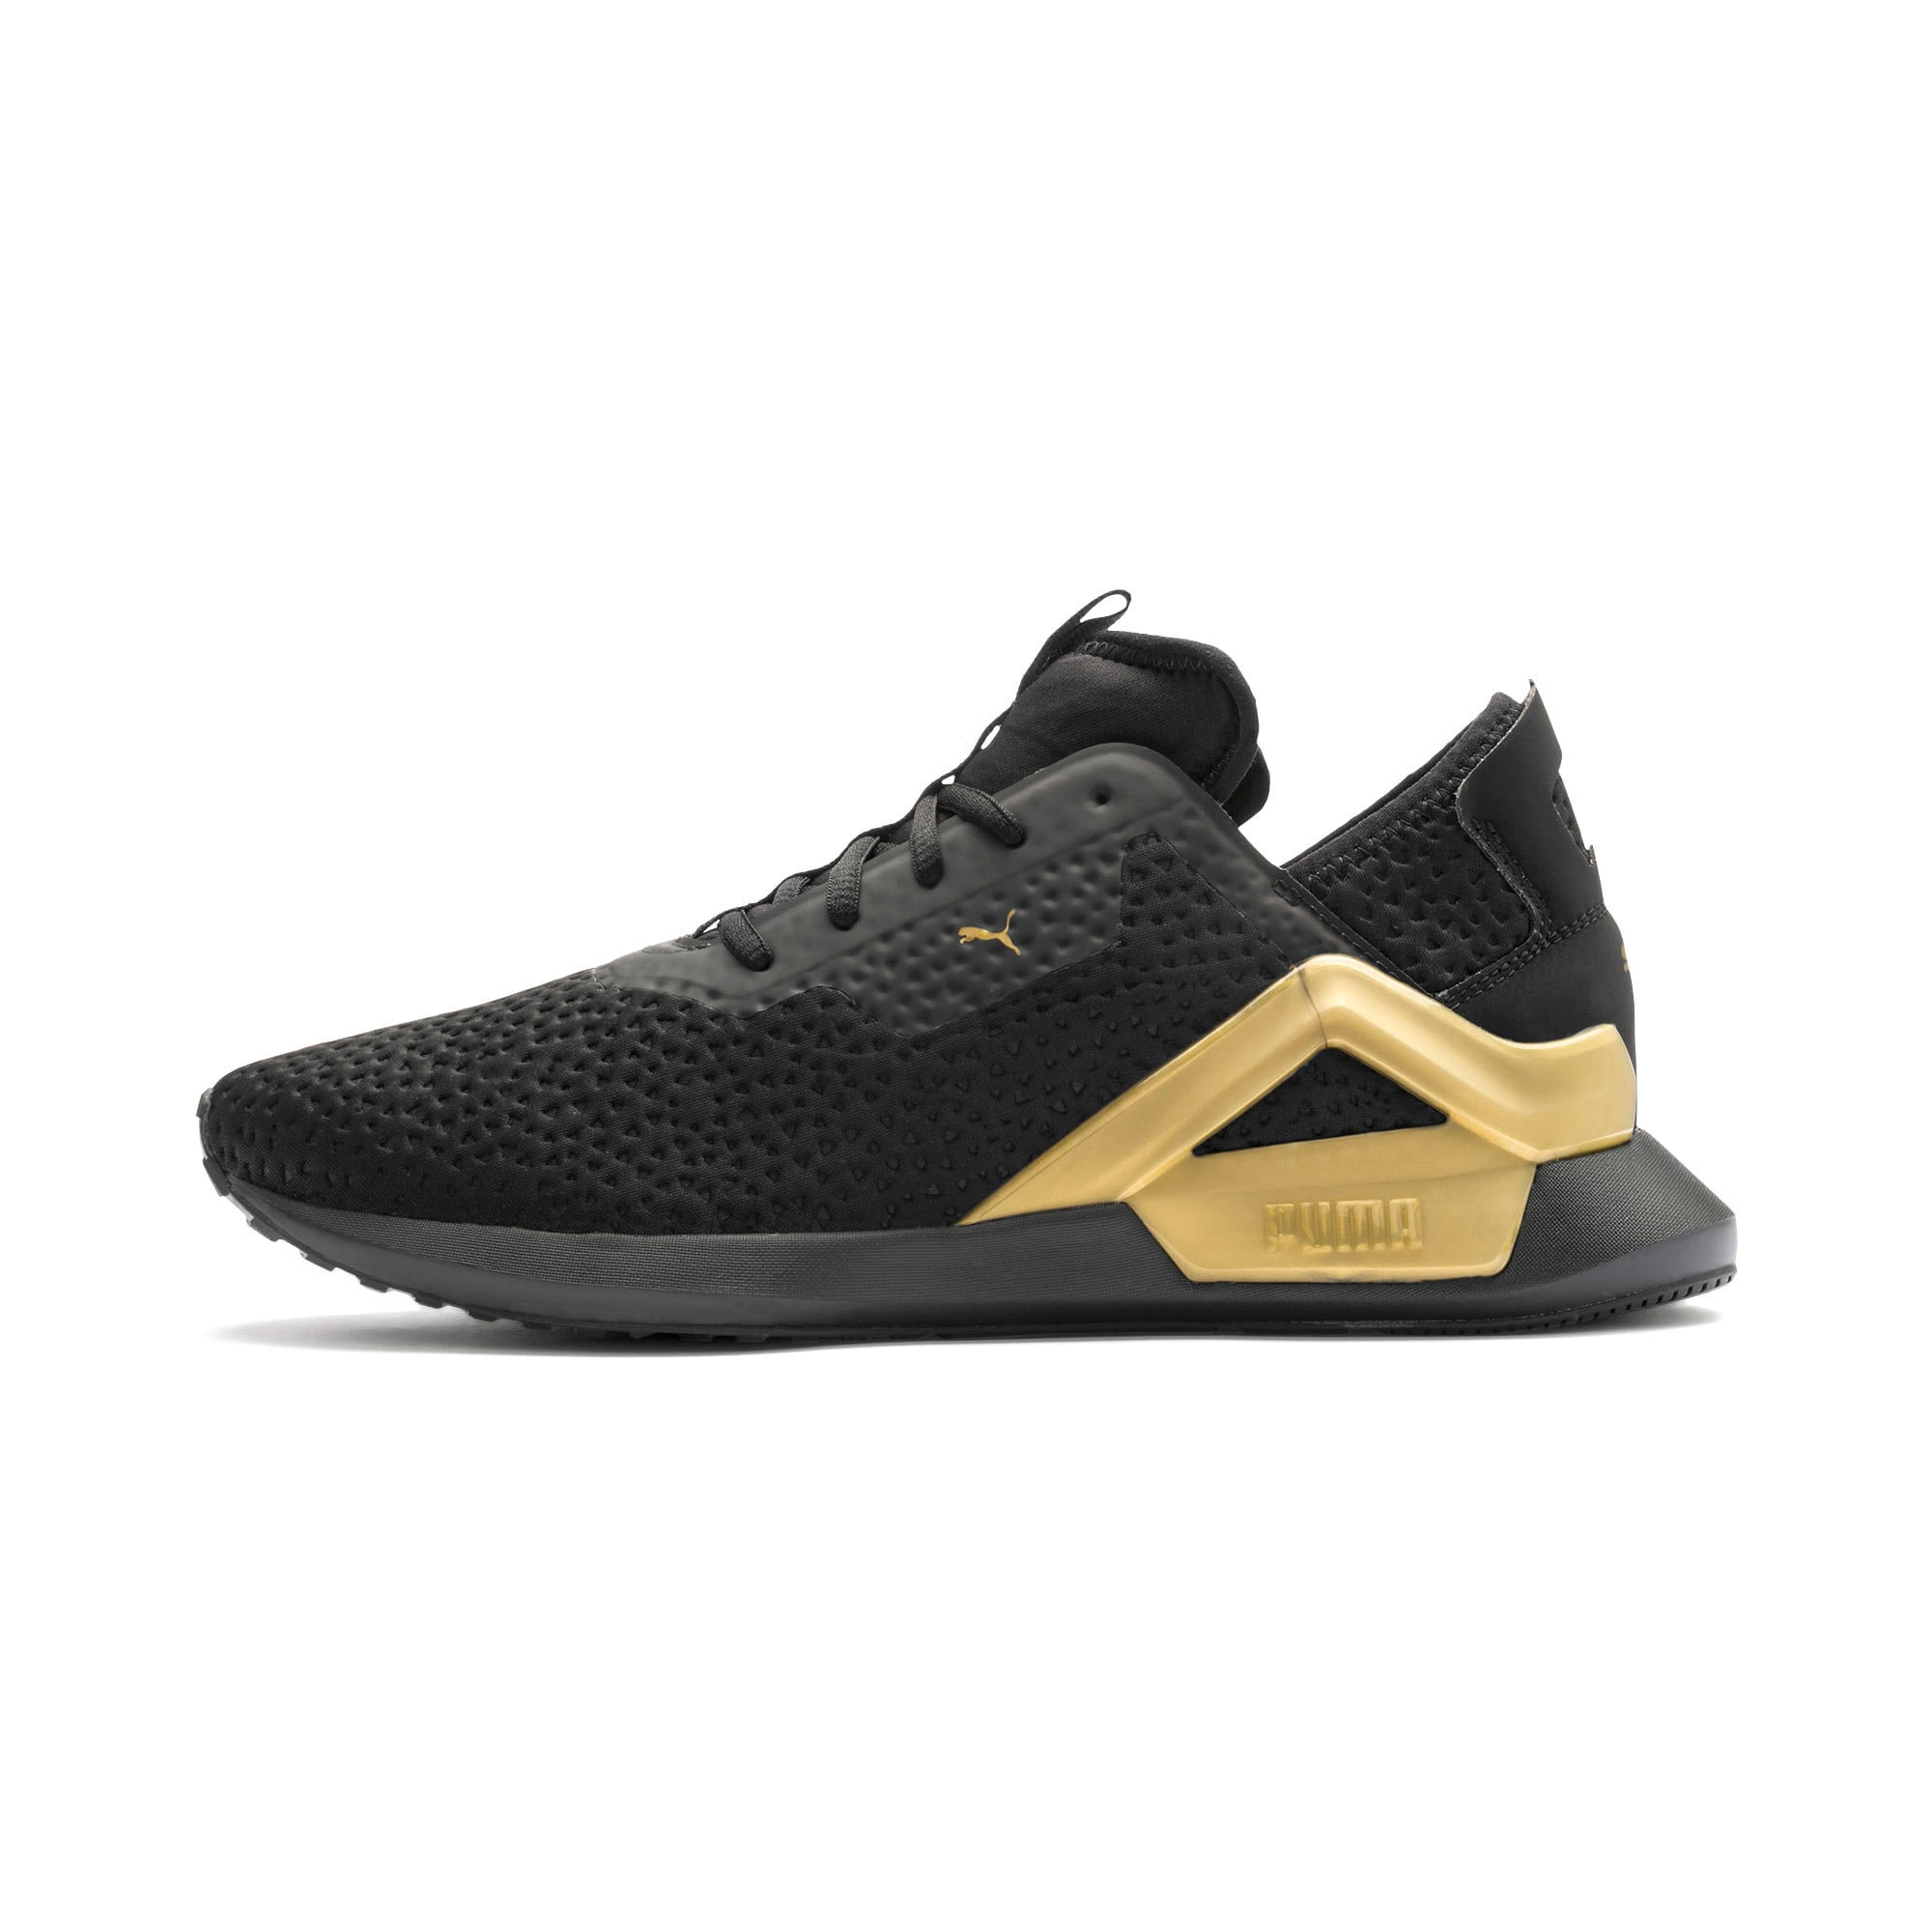 Thumbnail 1 of Rogue X Metallic Herren Sneaker, Puma Black-Gold, medium